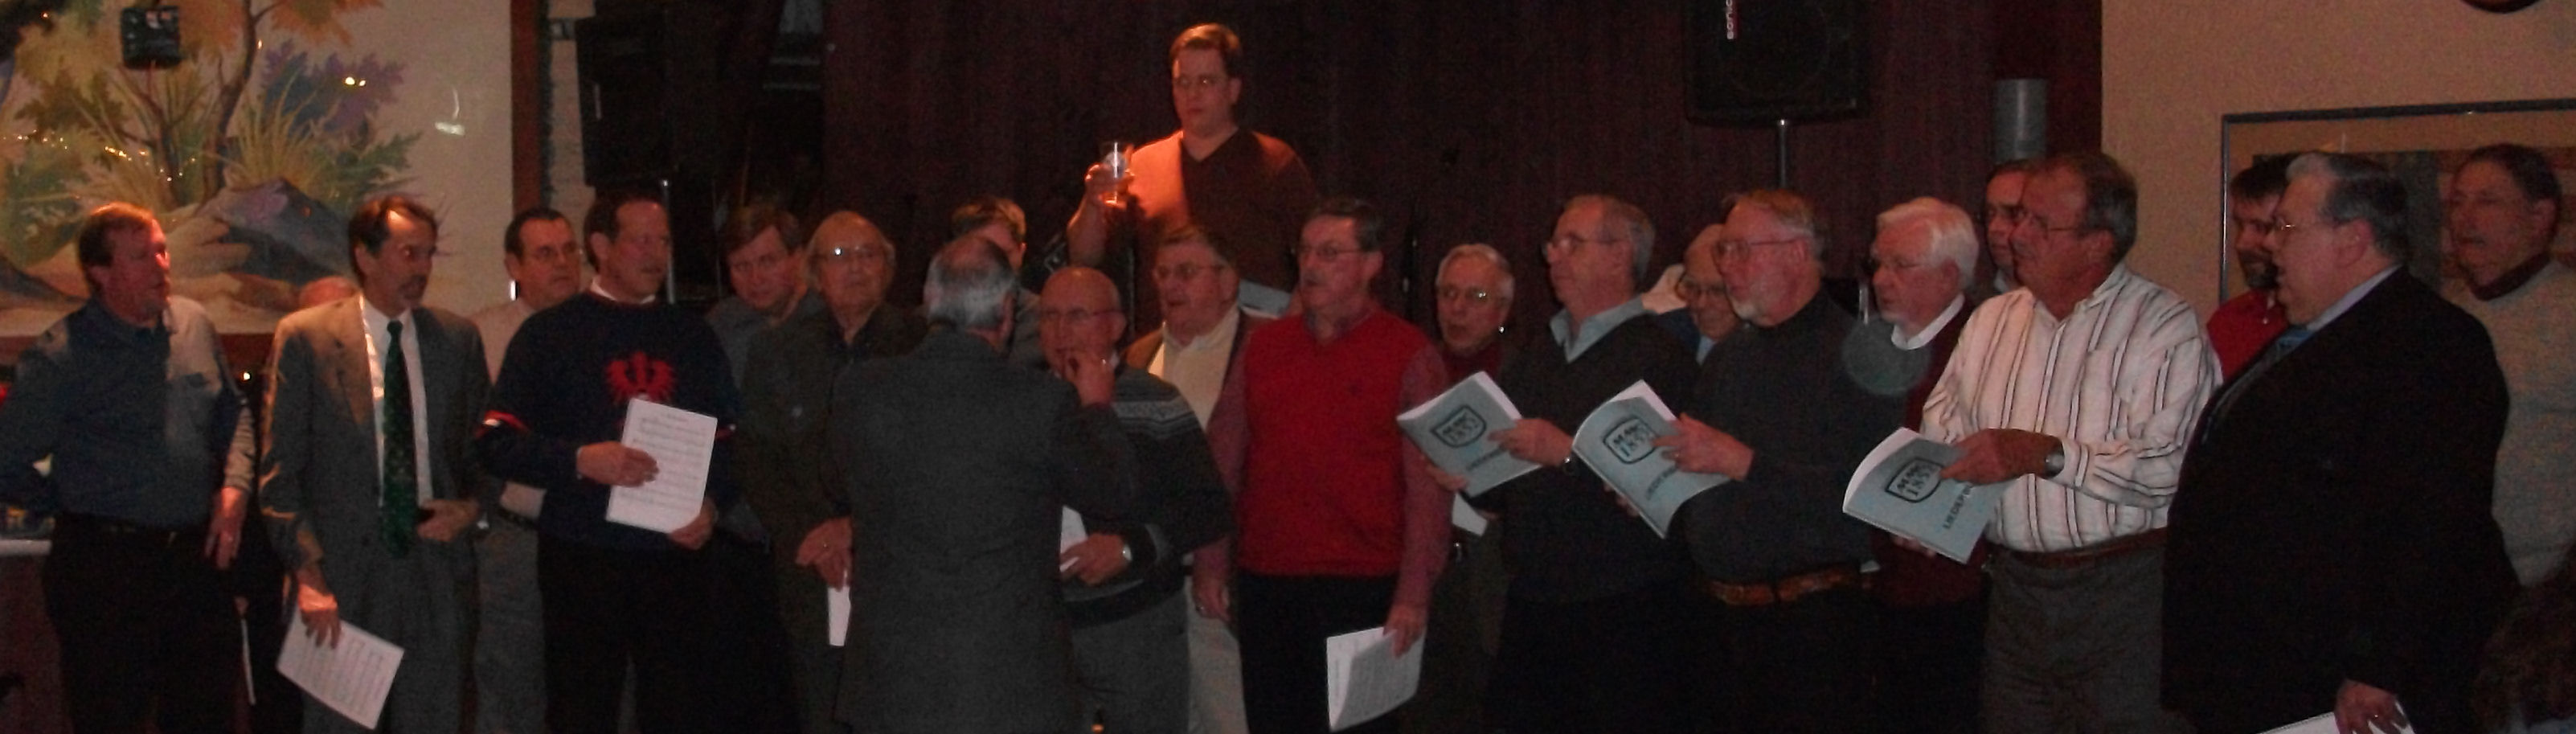 MMC singing at Essen Haus Madison February 13, 2010